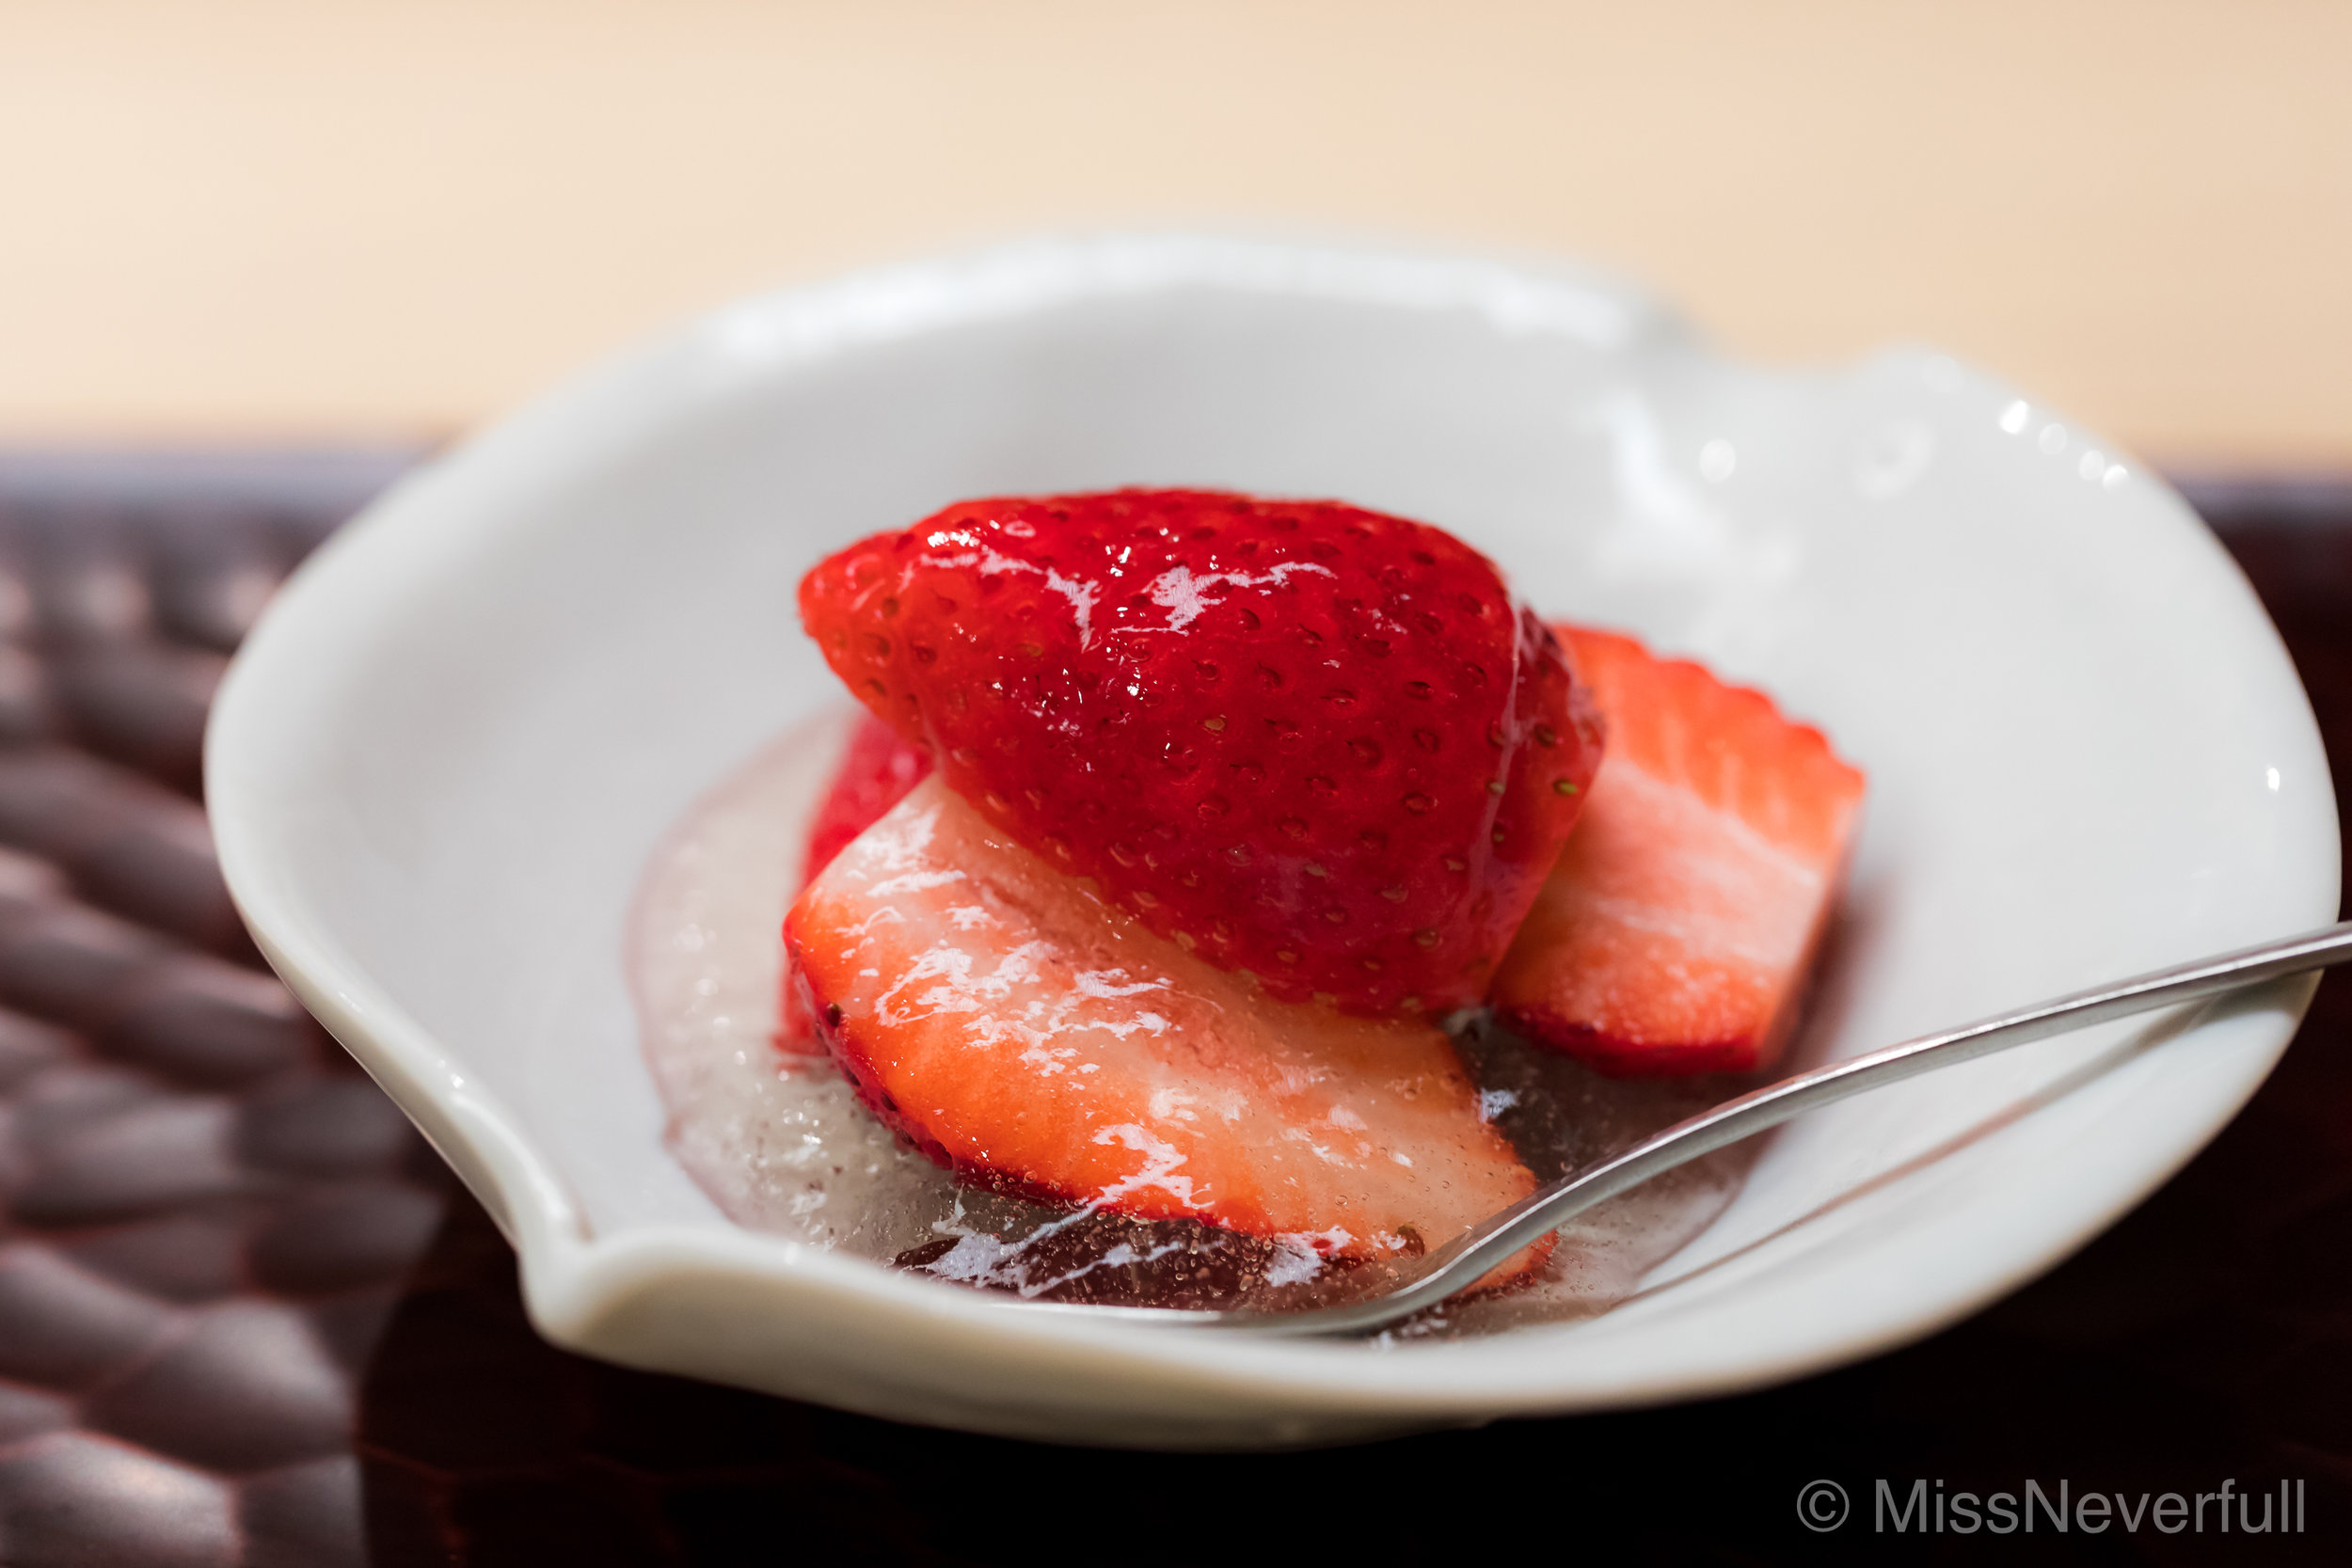 9. Dessert: Gunma Yayuhime, strawberry, white wine